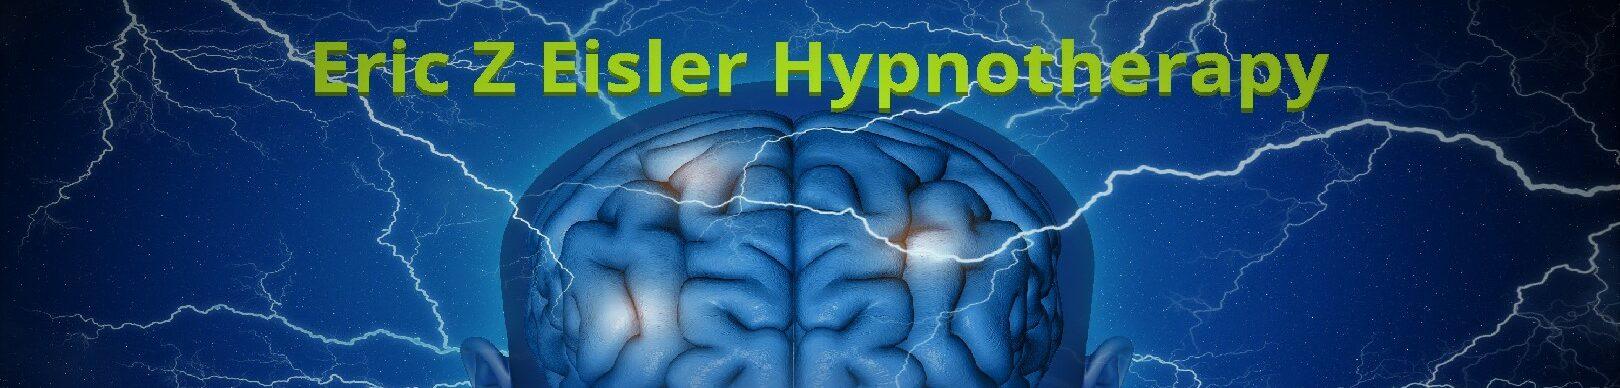 Eric Z Eisler Hypnotherapy